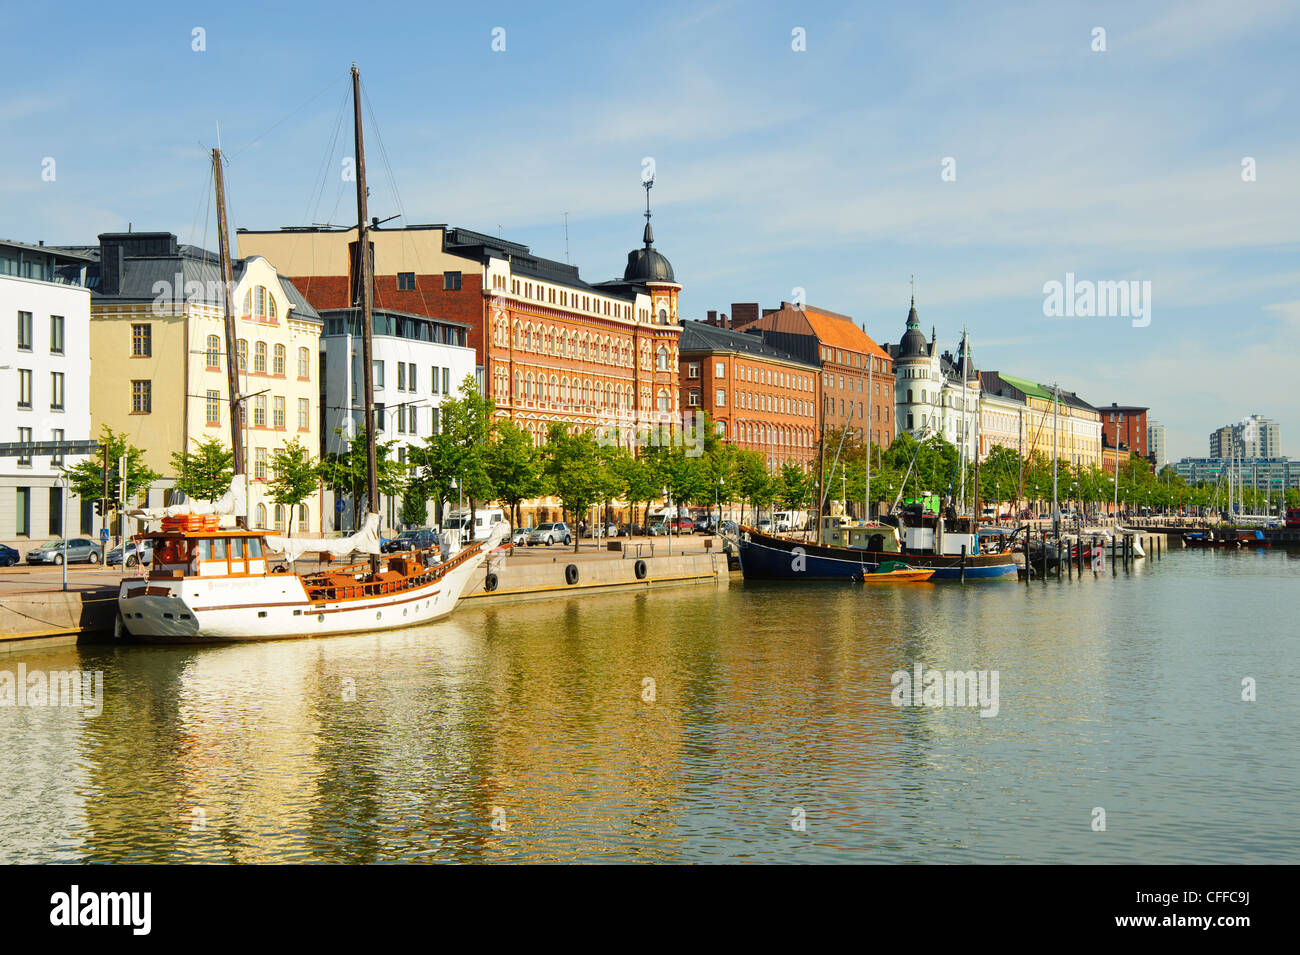 Boats at Halkolaituri Helsinki Finland with the street frontage of Pohjoisranta behind - Stock Image